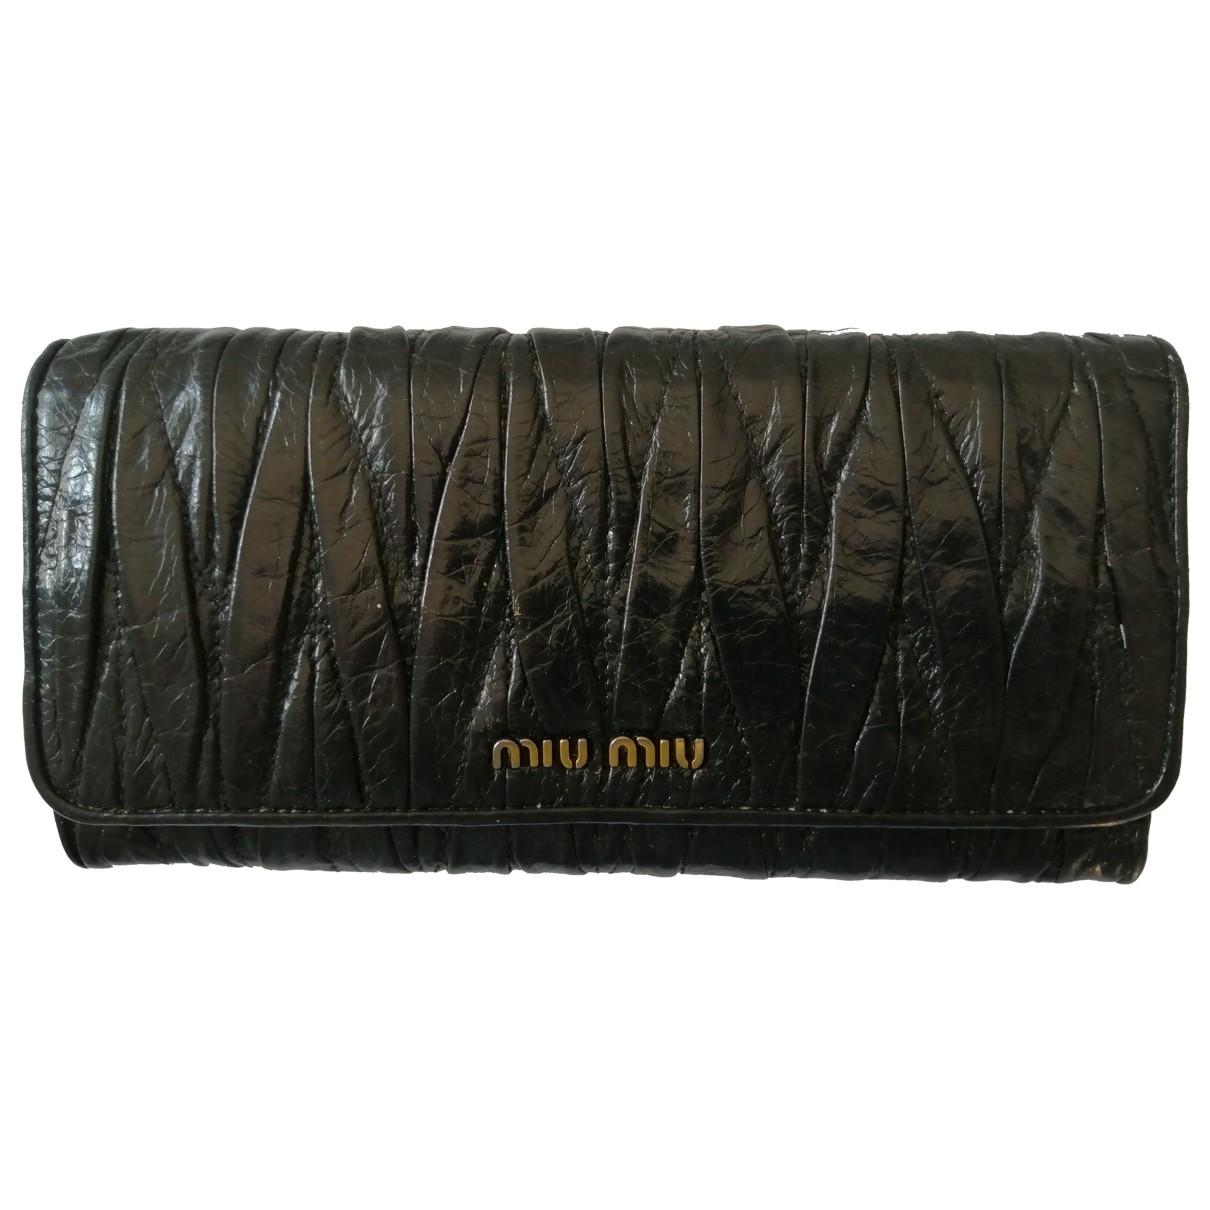 Miu Miu \N Black Patent leather wallet for Women \N